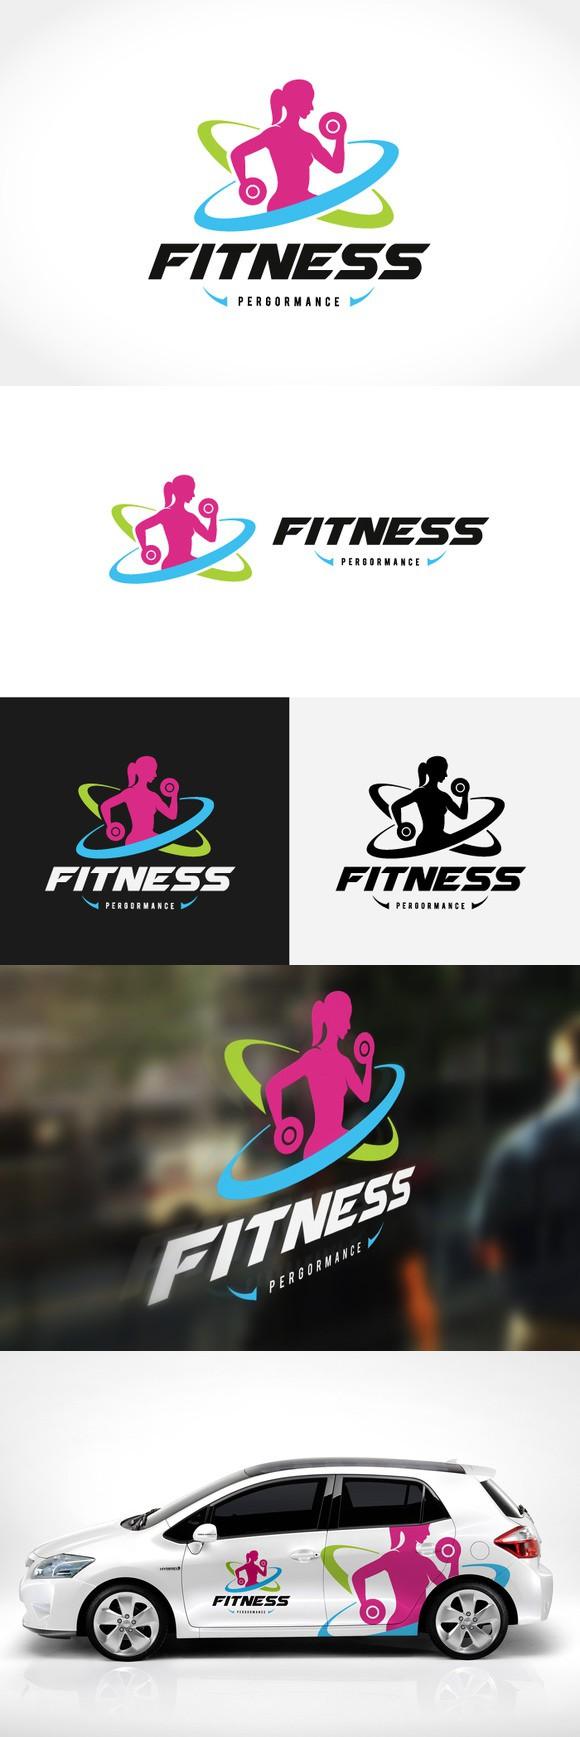 Fitness Logo Fitness logo, Logo templates, Logos